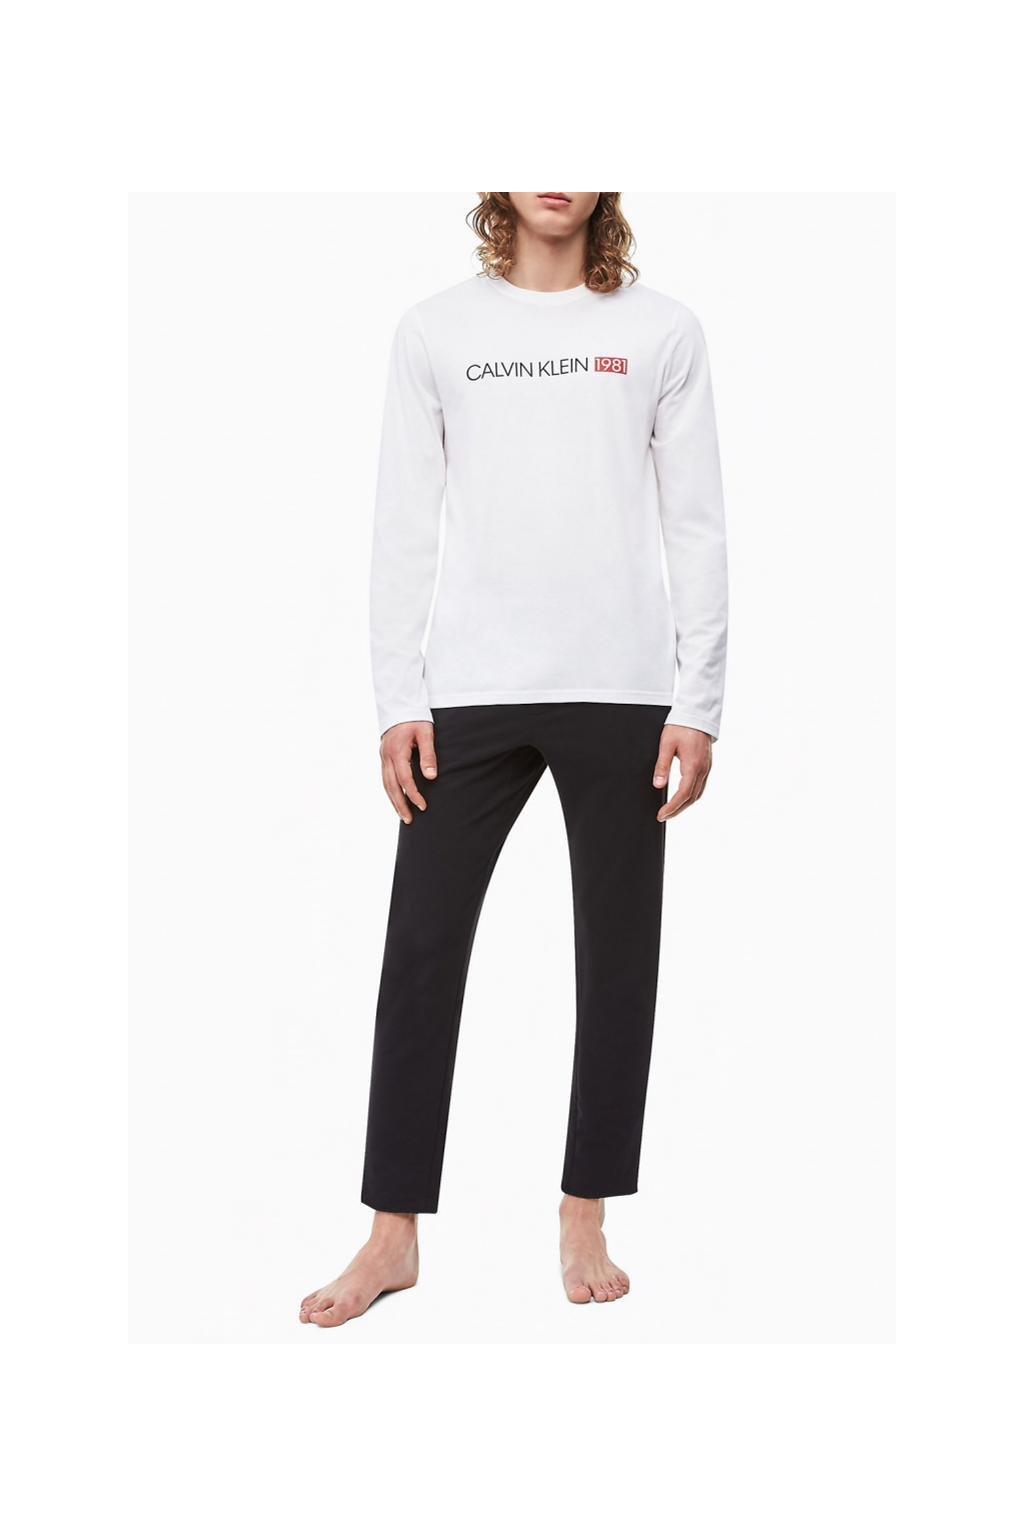 Calvin Klein pánské tričko 1981 bold - bílé